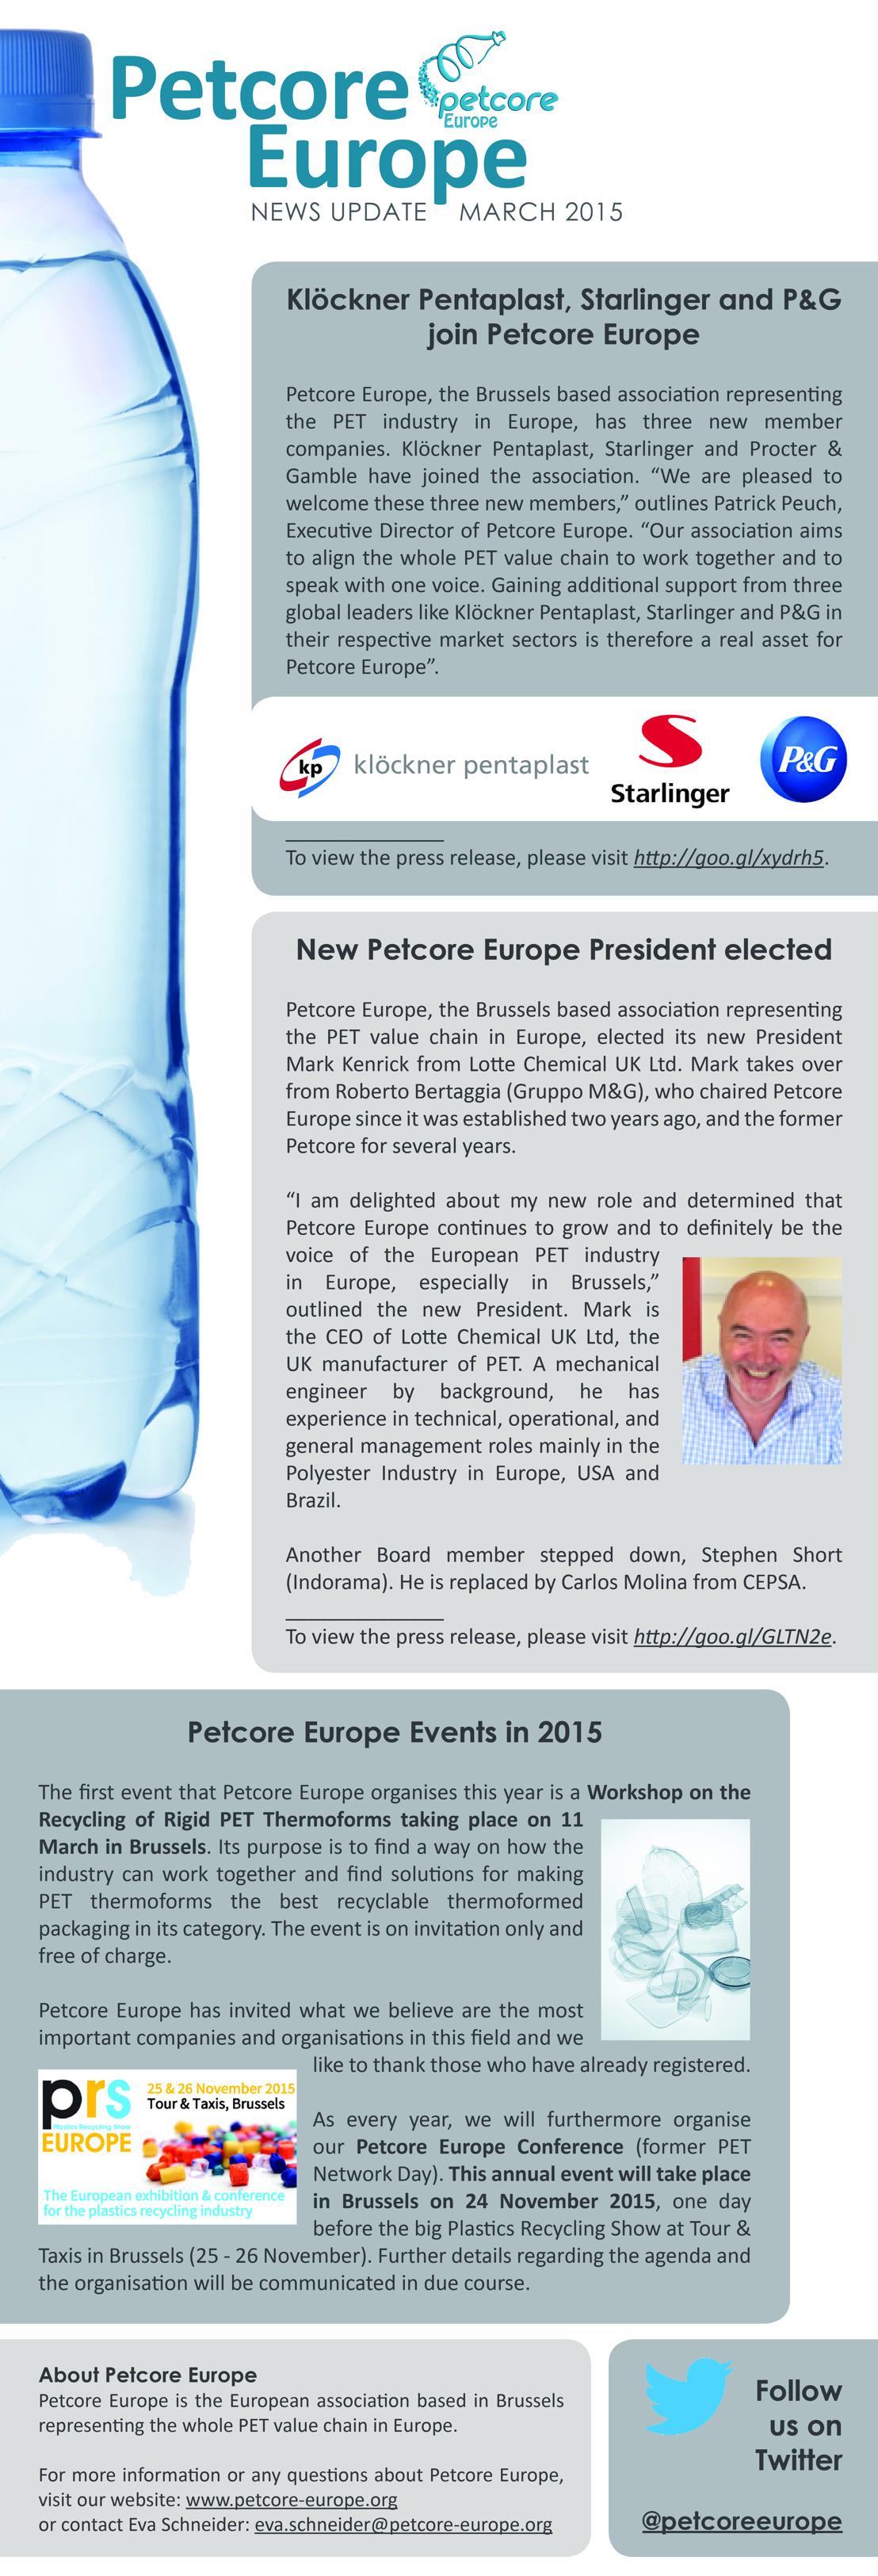 Petcore Europe News Update - March 2015